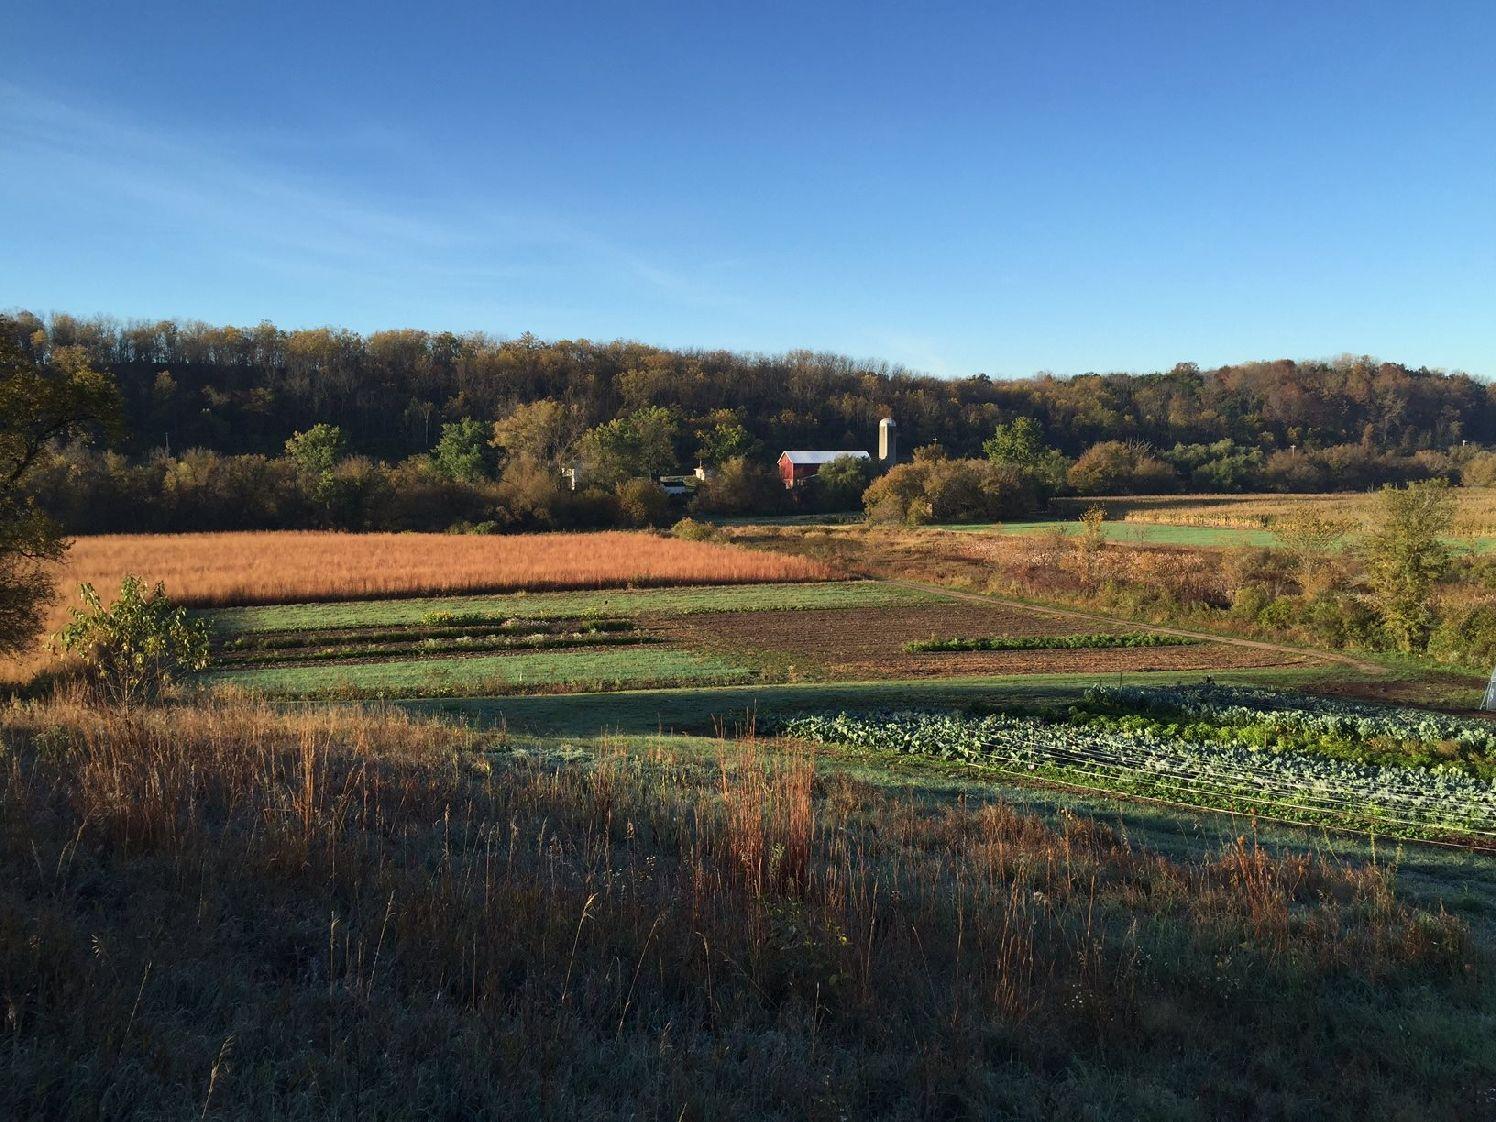 field-and-barn.jpg